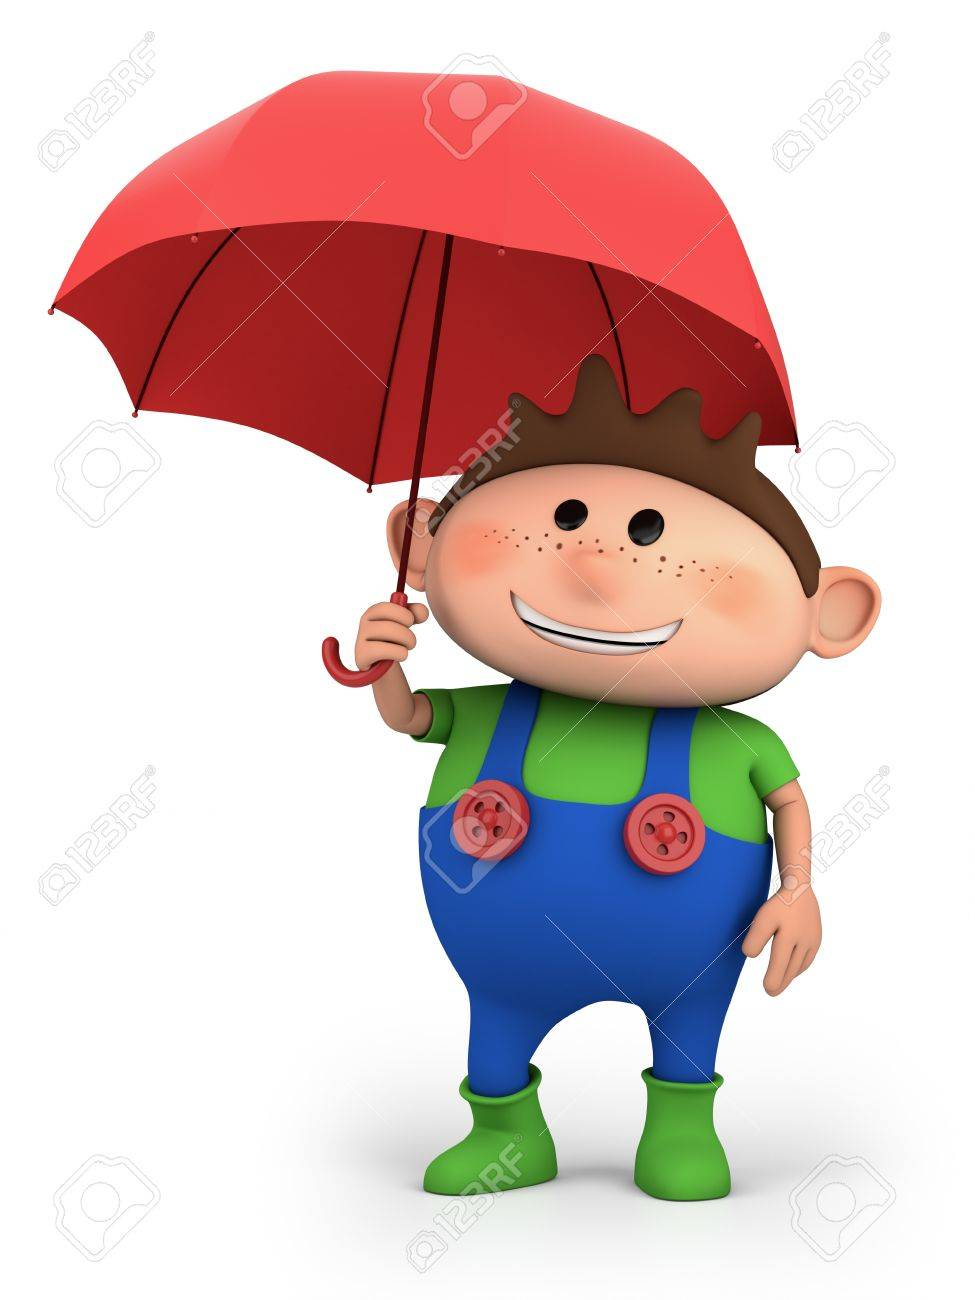 boy with umbrella high quality 3d illustration stock photo